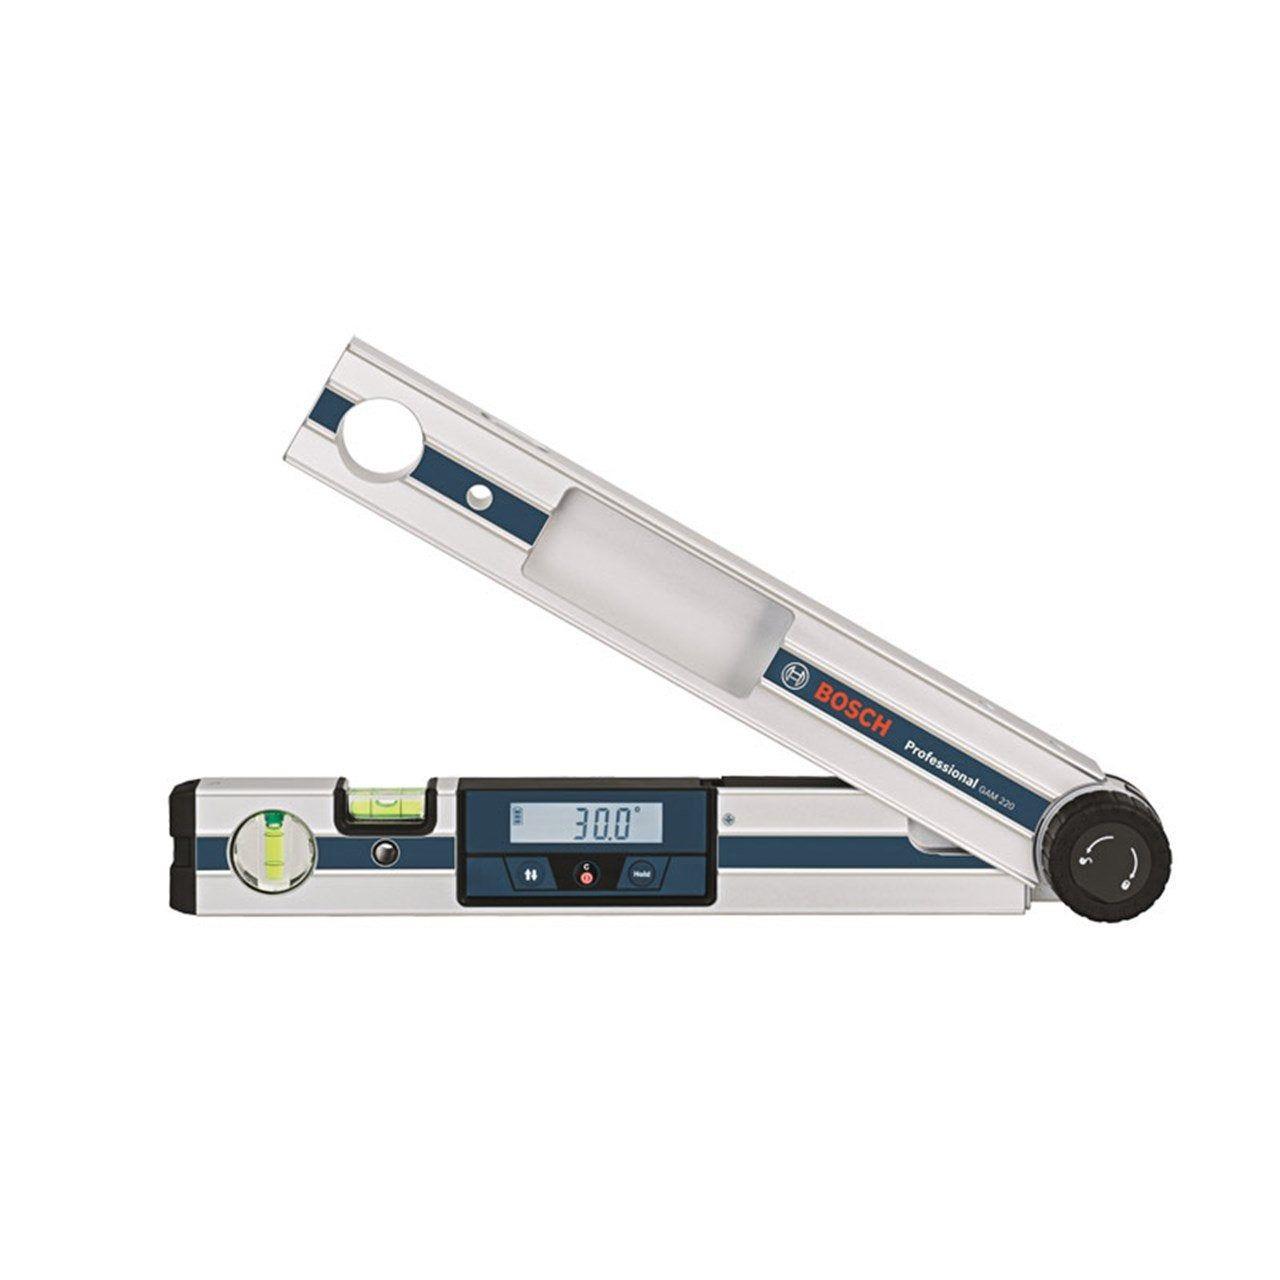 Télémètre Laser Bosch Professional Mesureur Dangles Gam